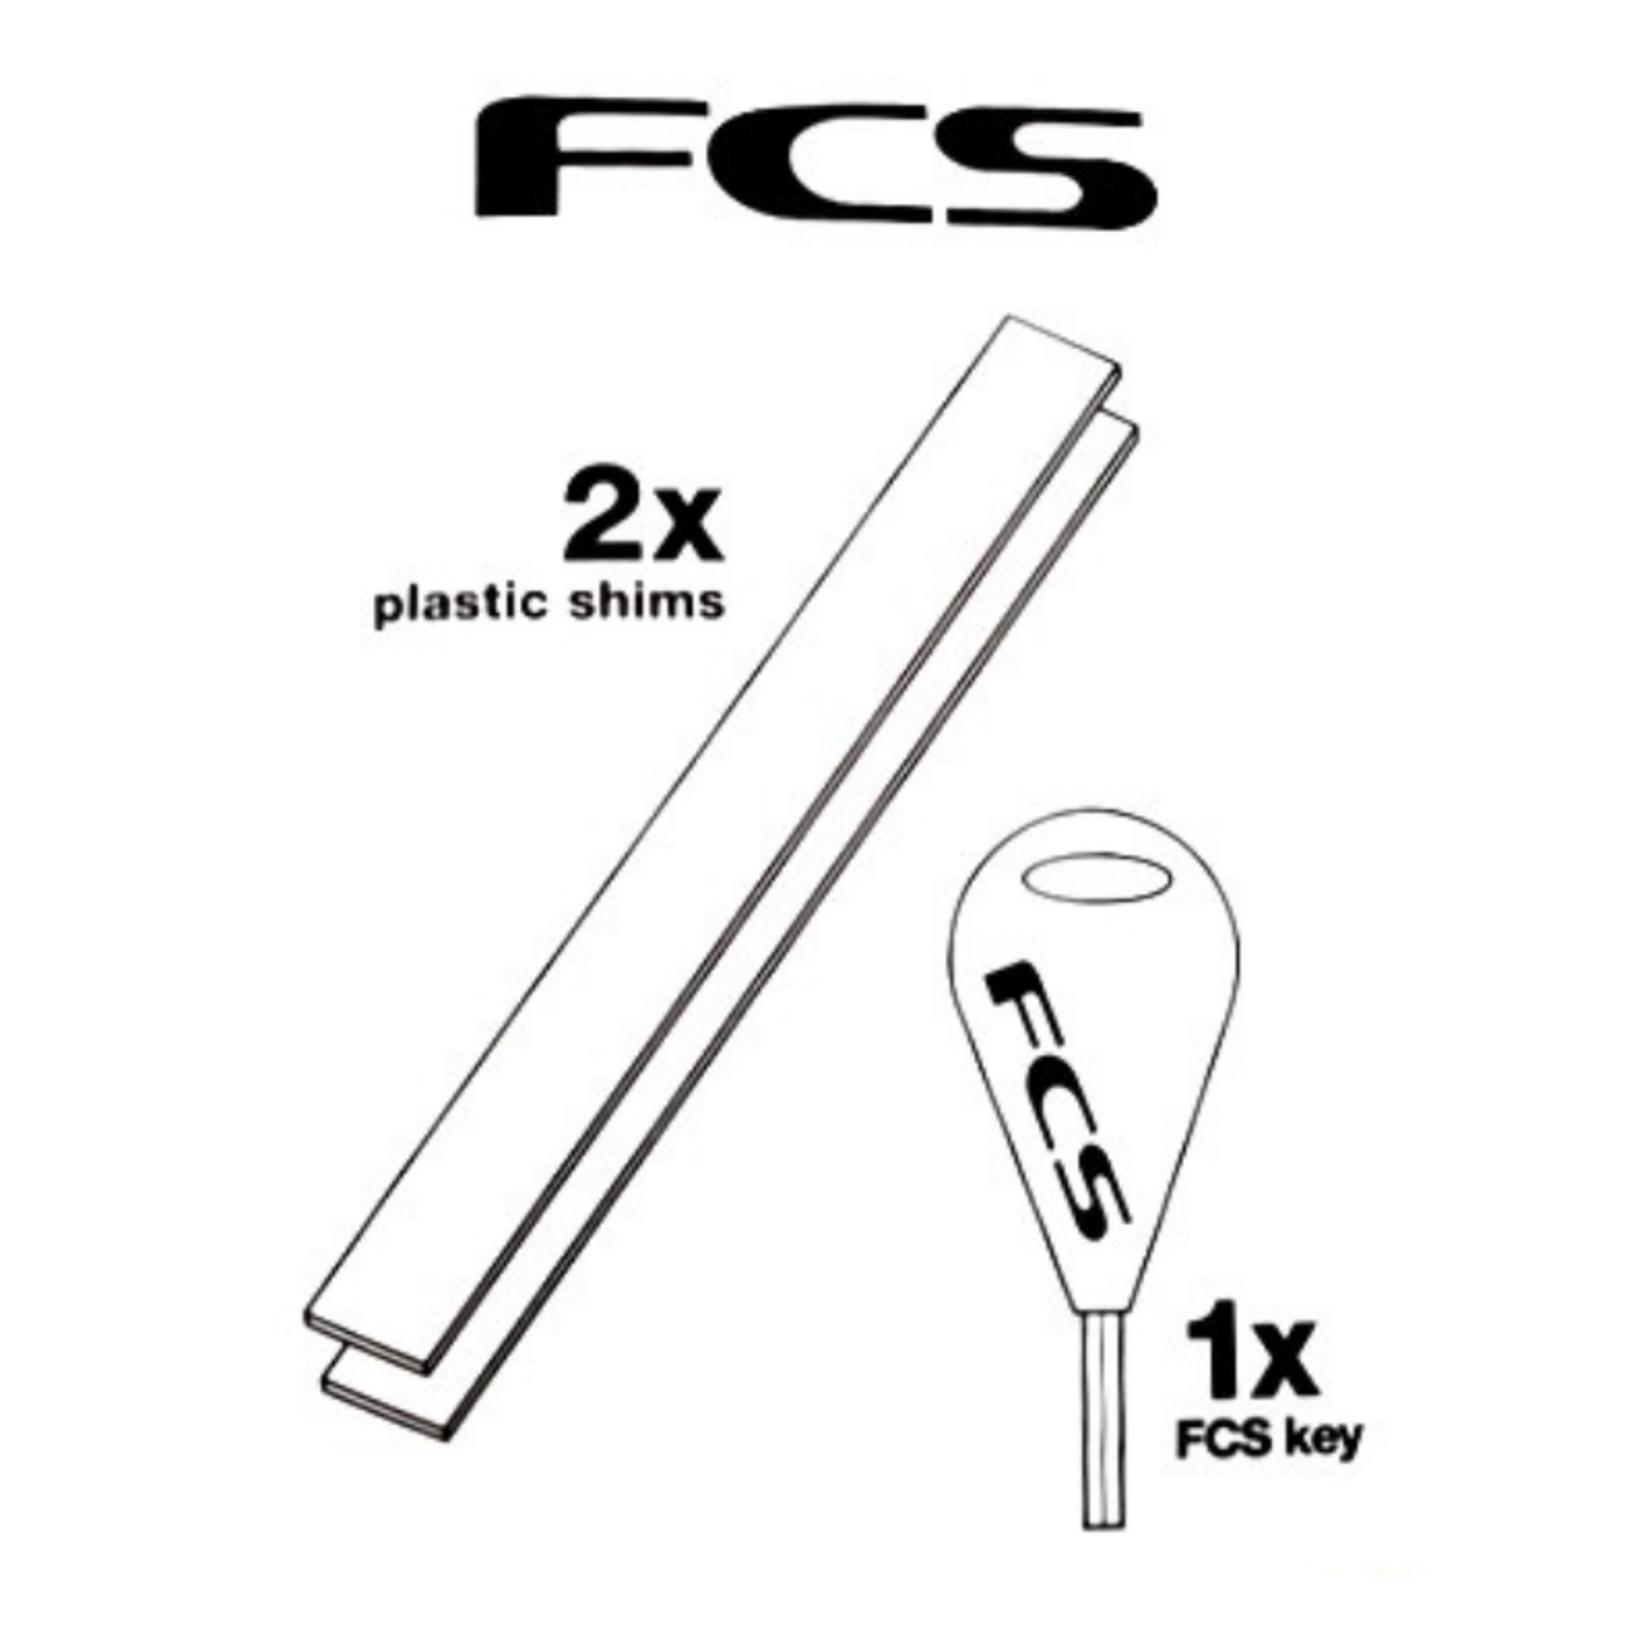 FCS FCS plastic shims X2 + Fin Key